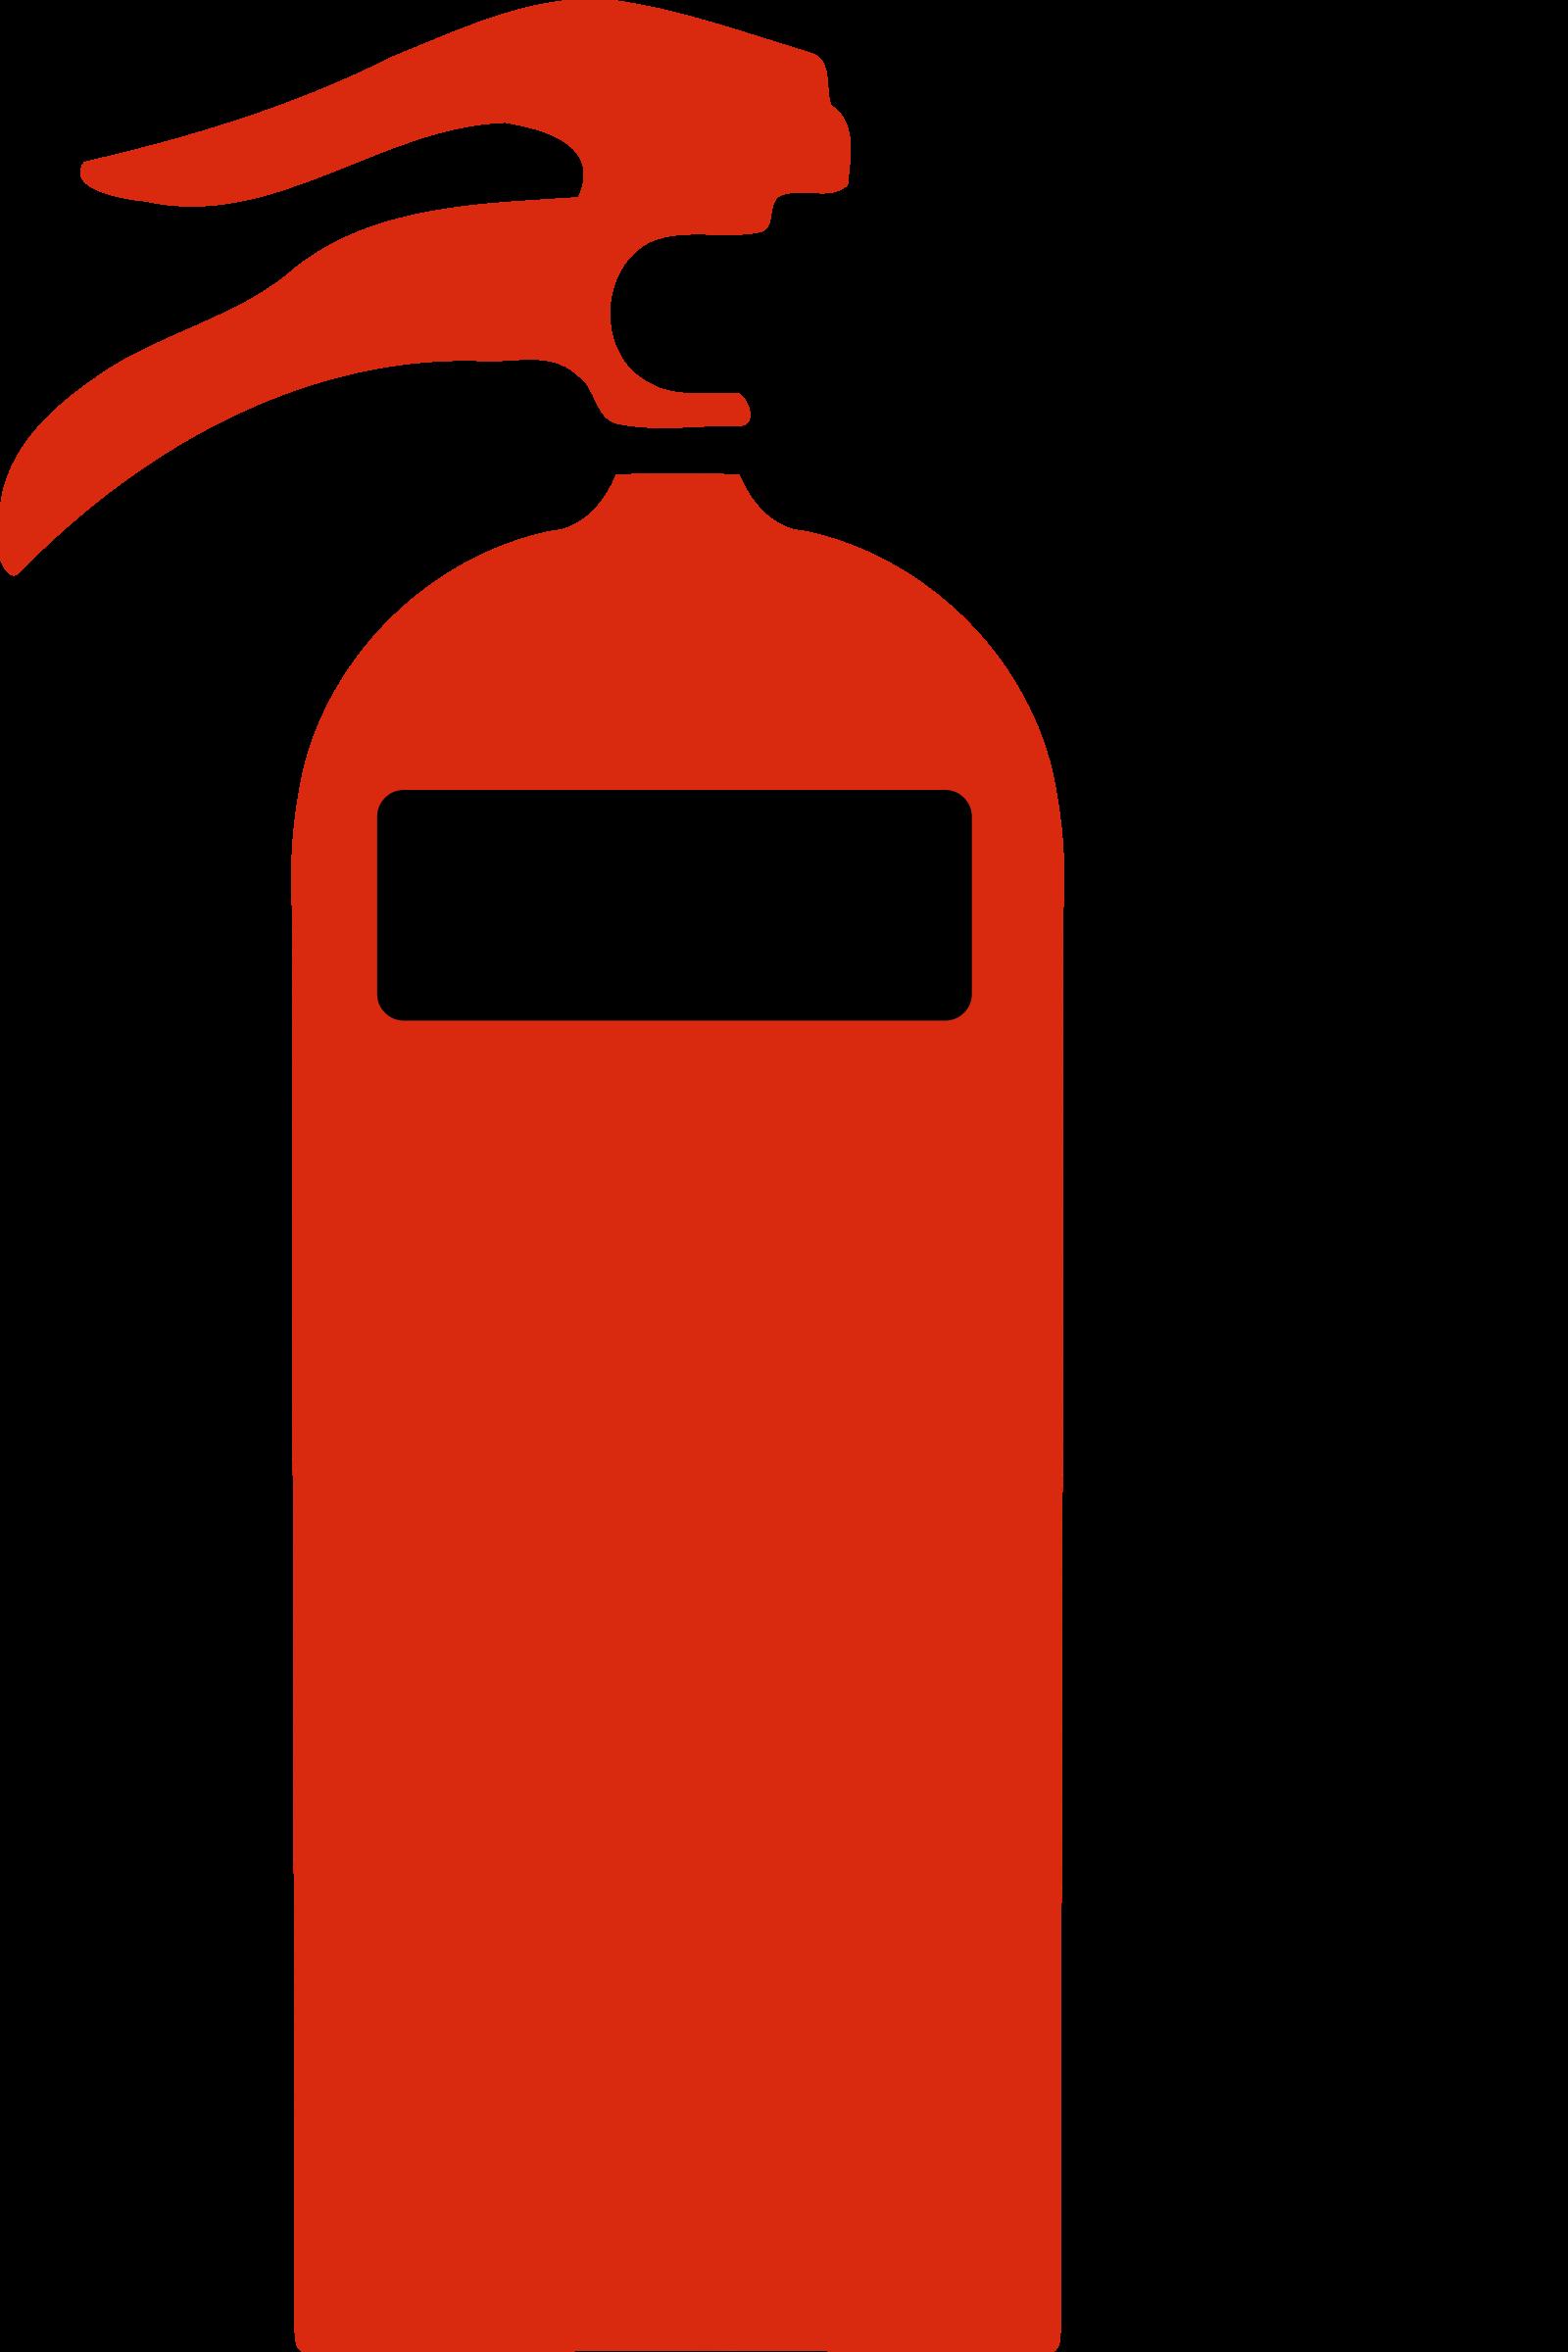 Extinguisher Png Image Clip Art Extinguisher Fire Extinguisher